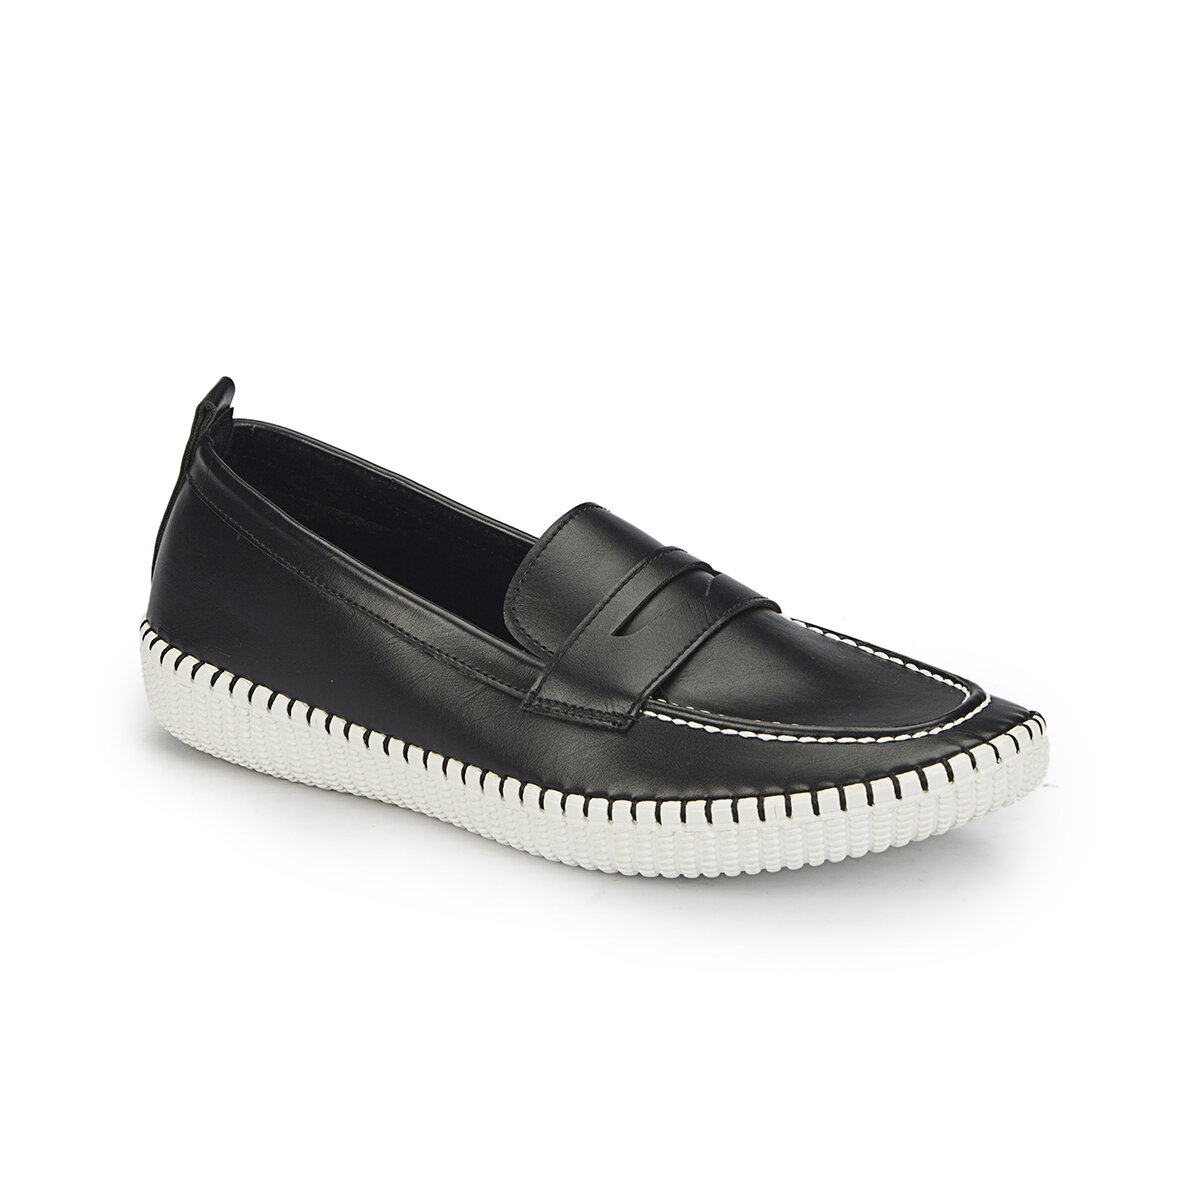 FLO 81. 311382.Z Black Women Loafer Shoes Polaris